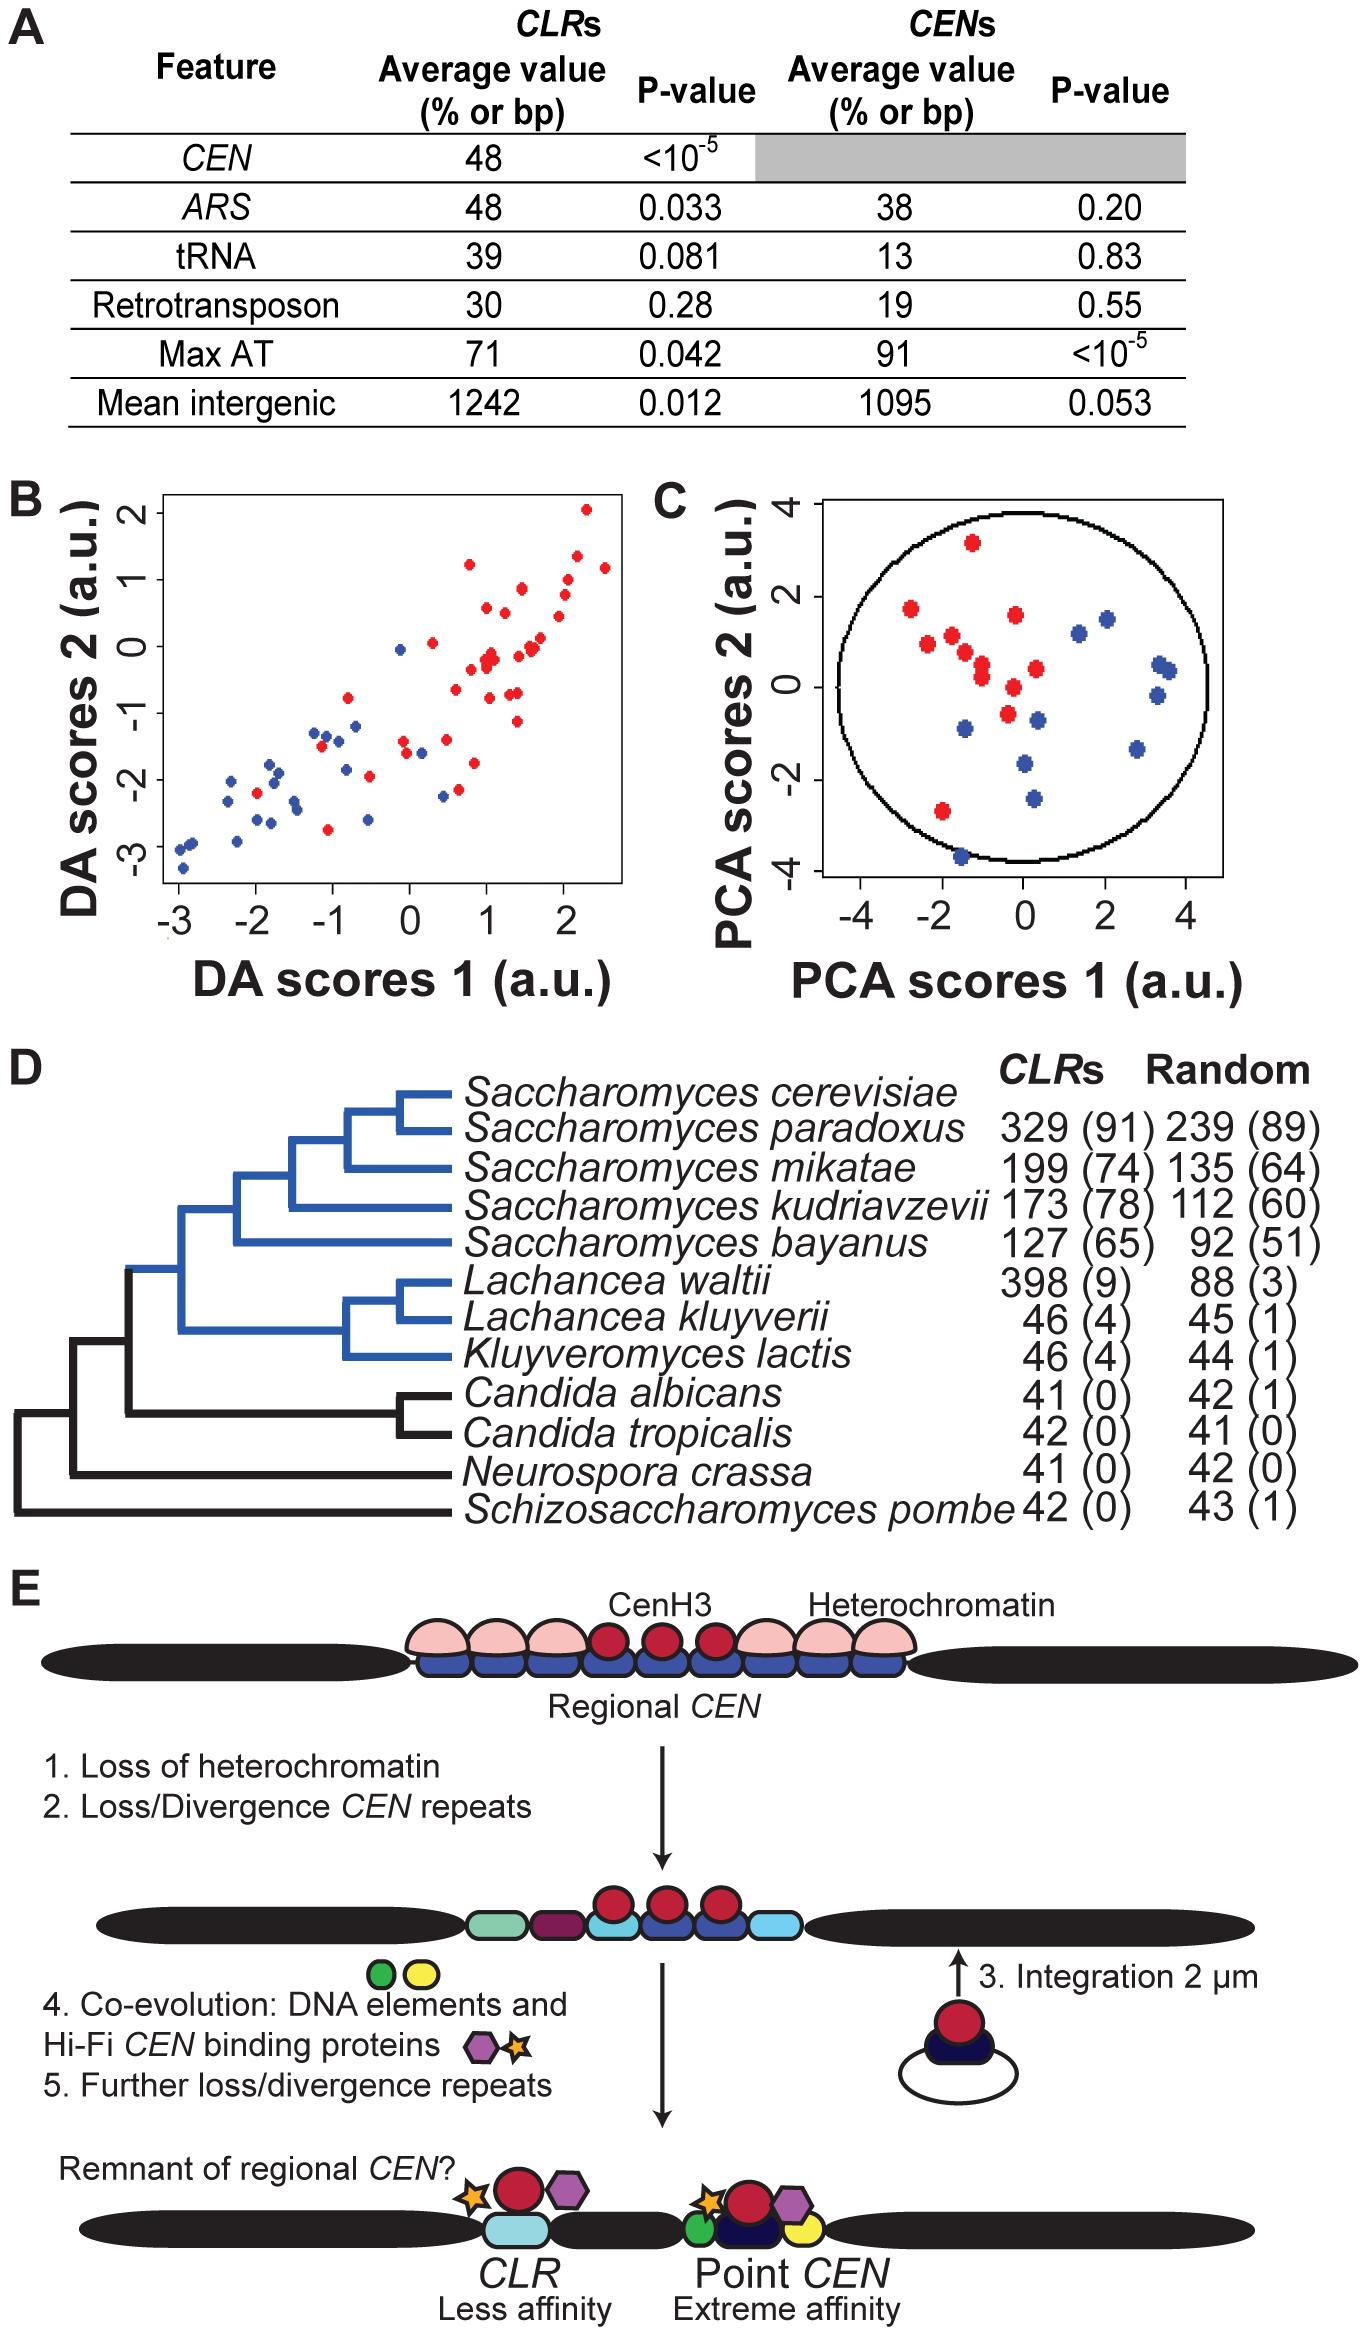 Genomic features of <i>CLR</i>s.